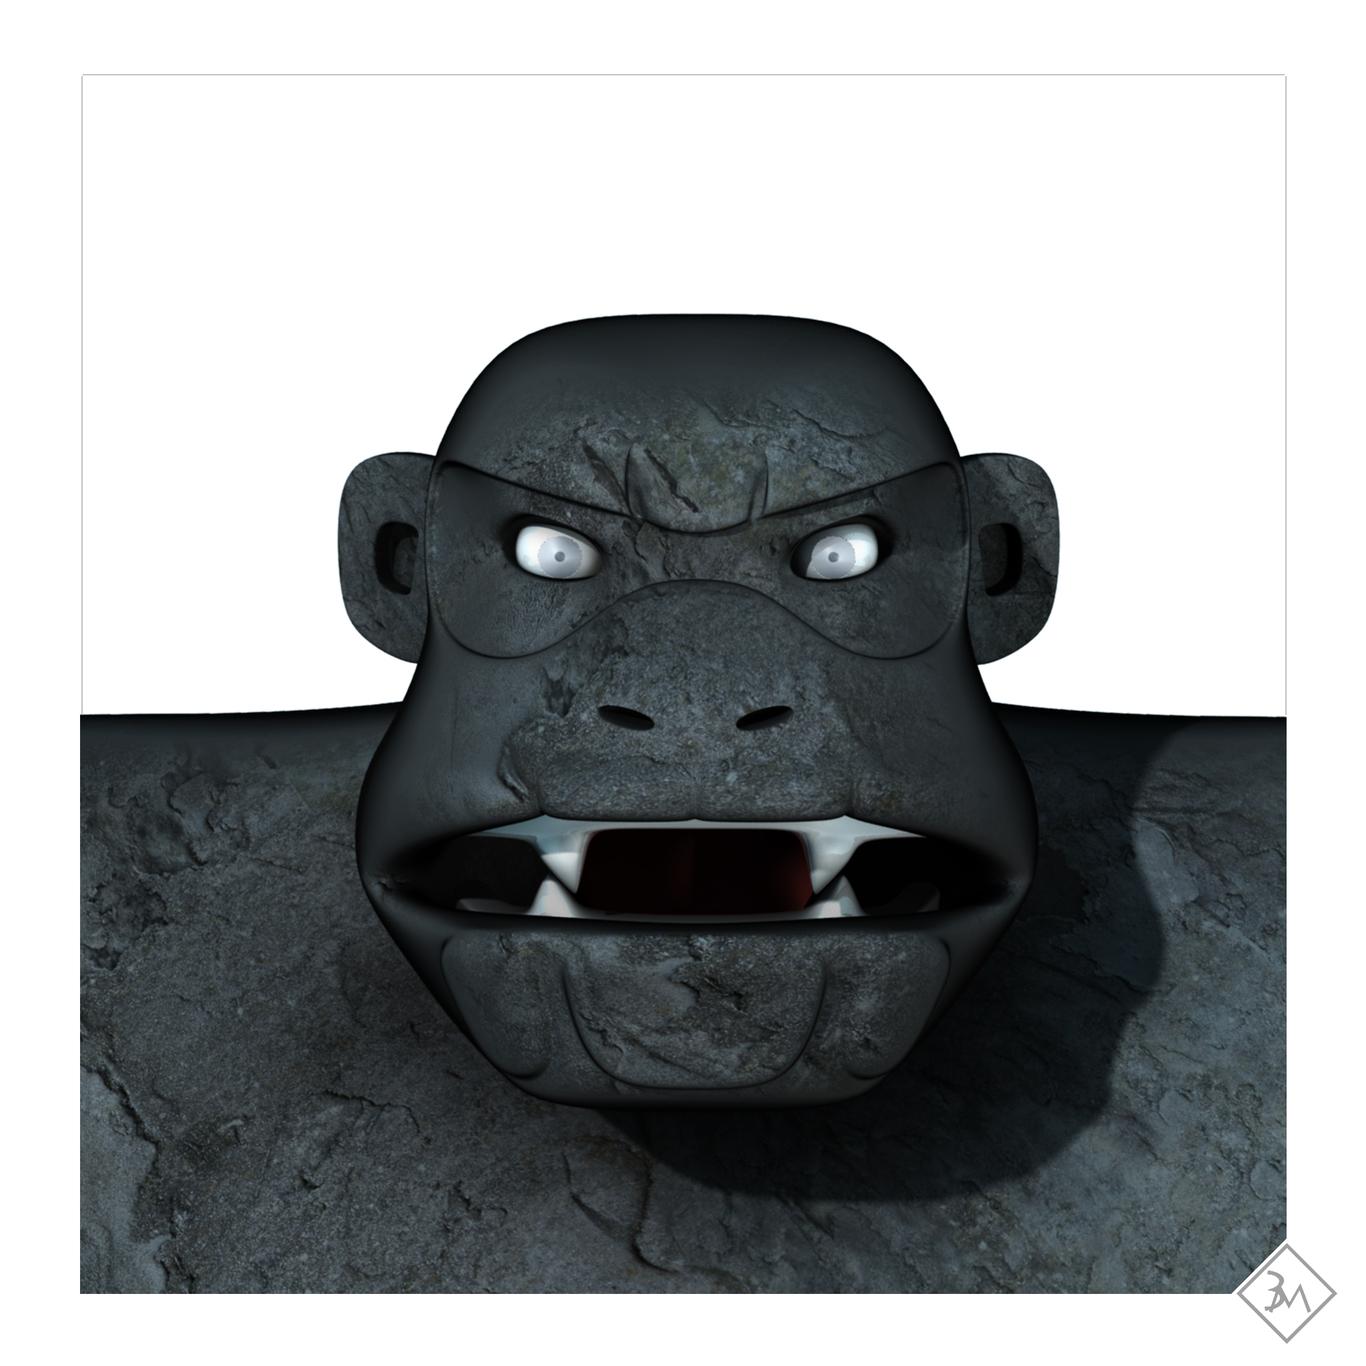 Jeremy3dm igoo the rock ape 1 92b51237 ogsc